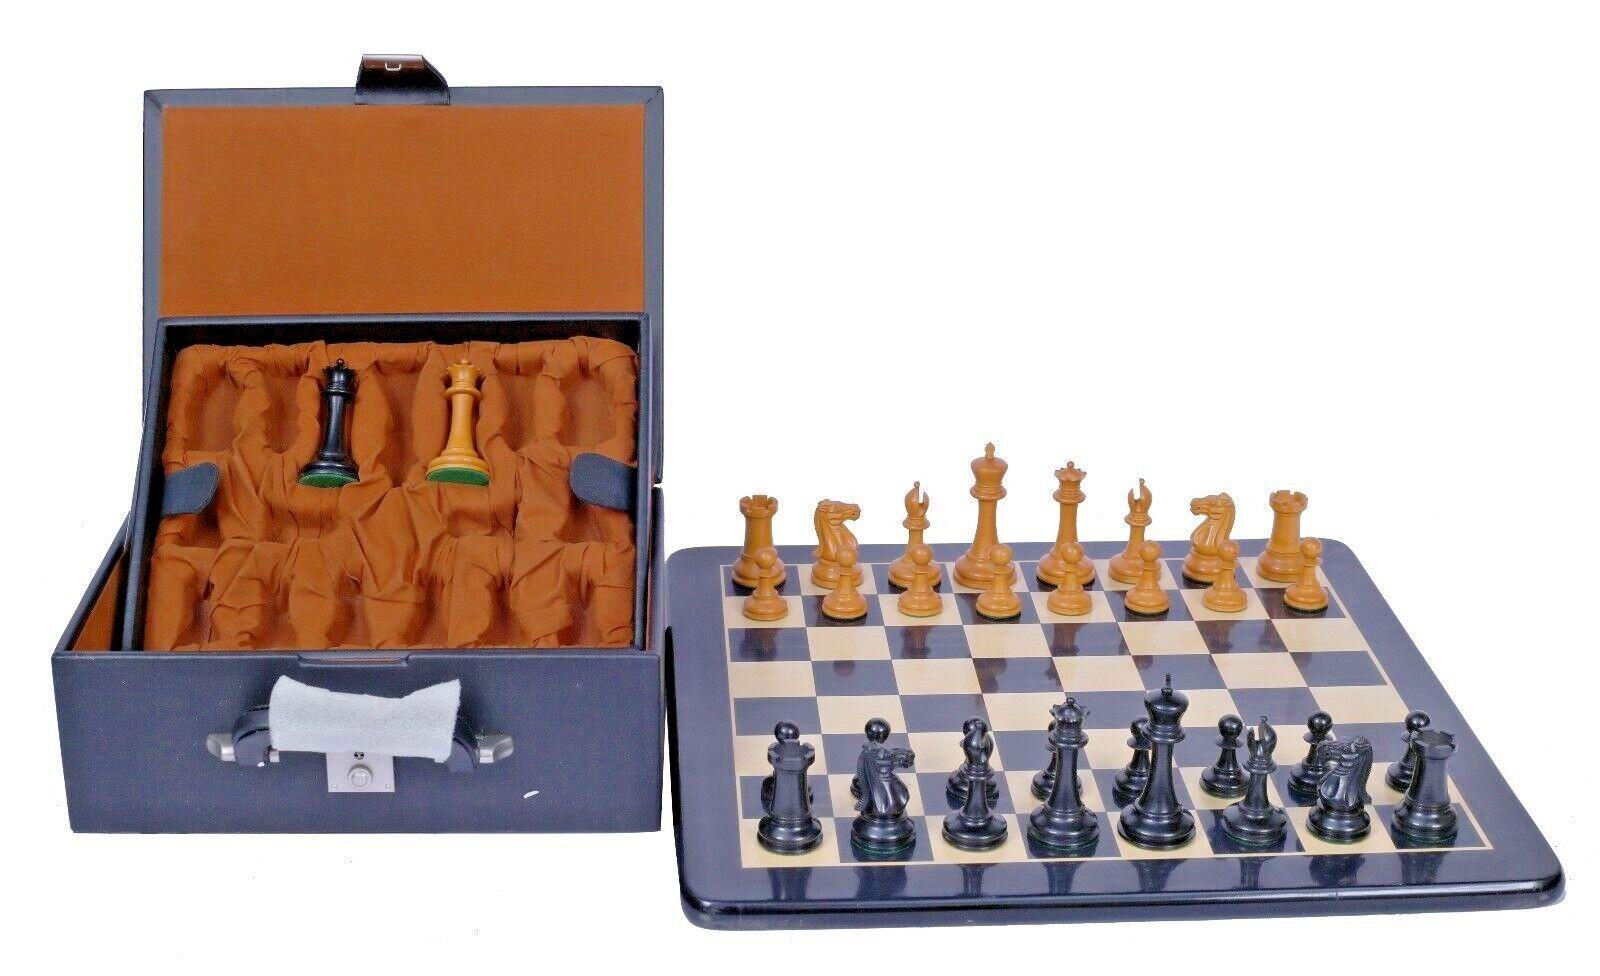 Emil Emil Emil Kemény 1892-93 Reproduction Antique Chessmen with Board & Presentation Box 19dd11